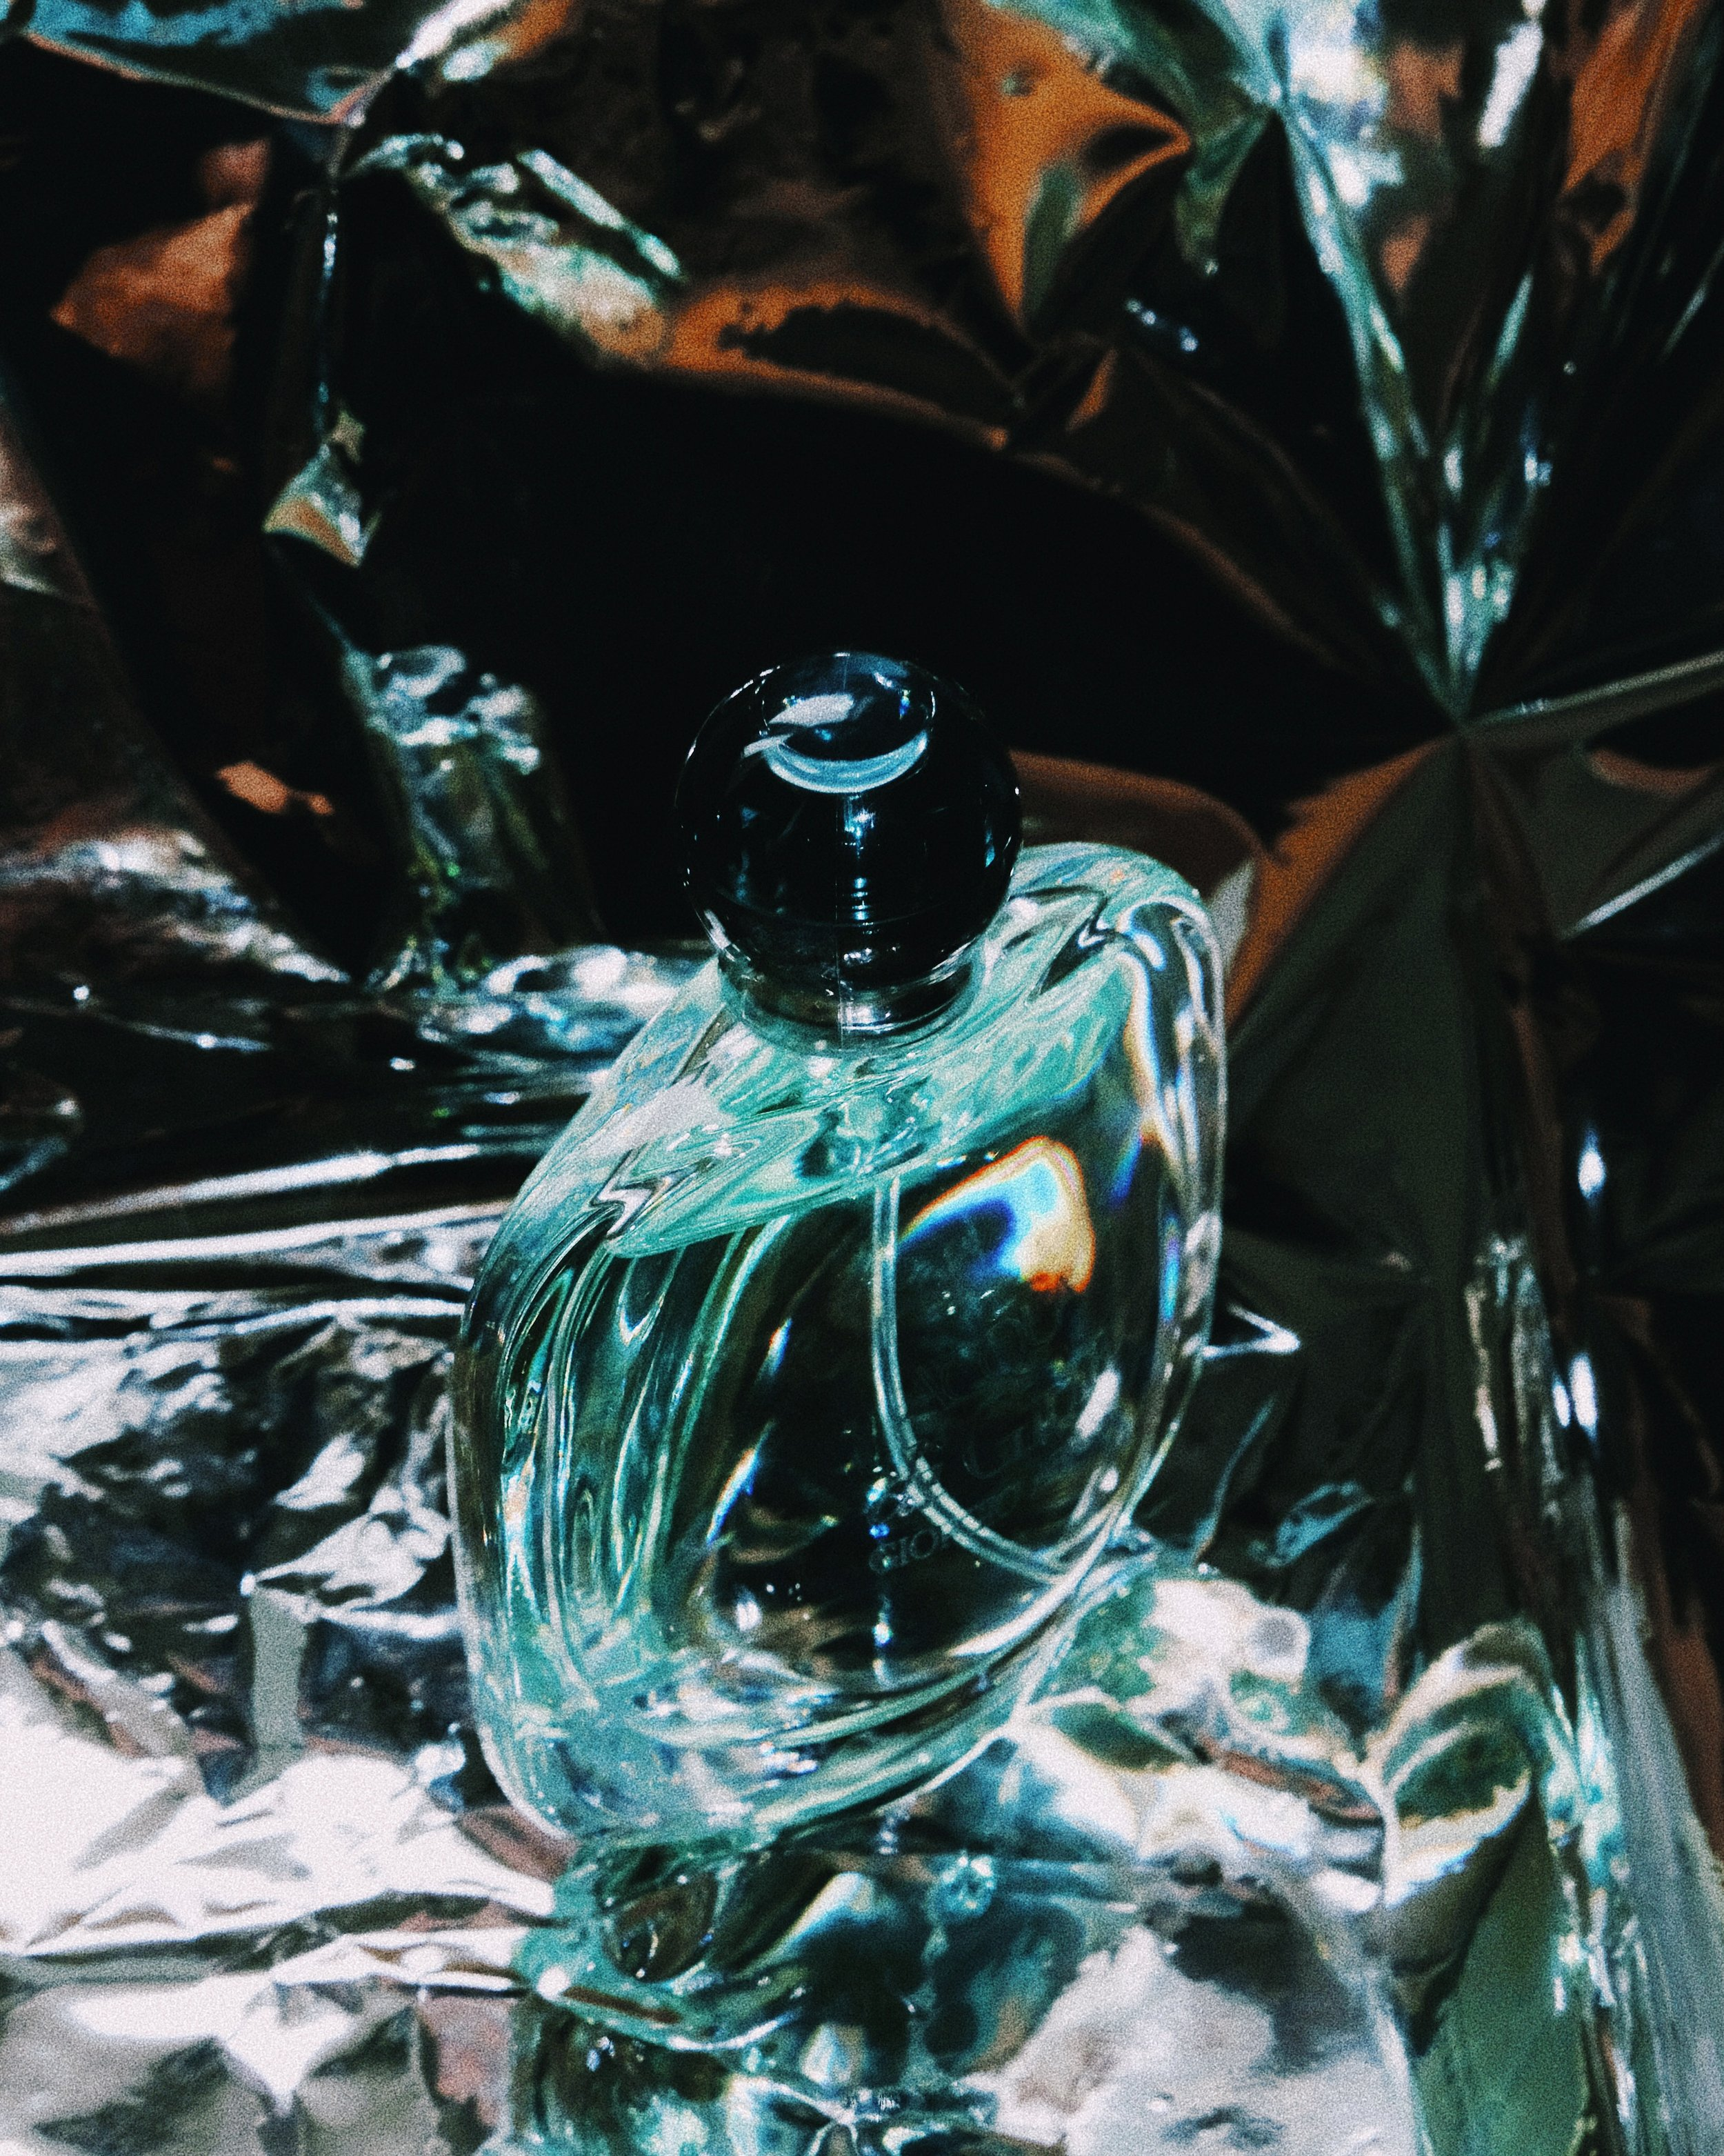 reflection-bottle-lauren-abbazio.JPG